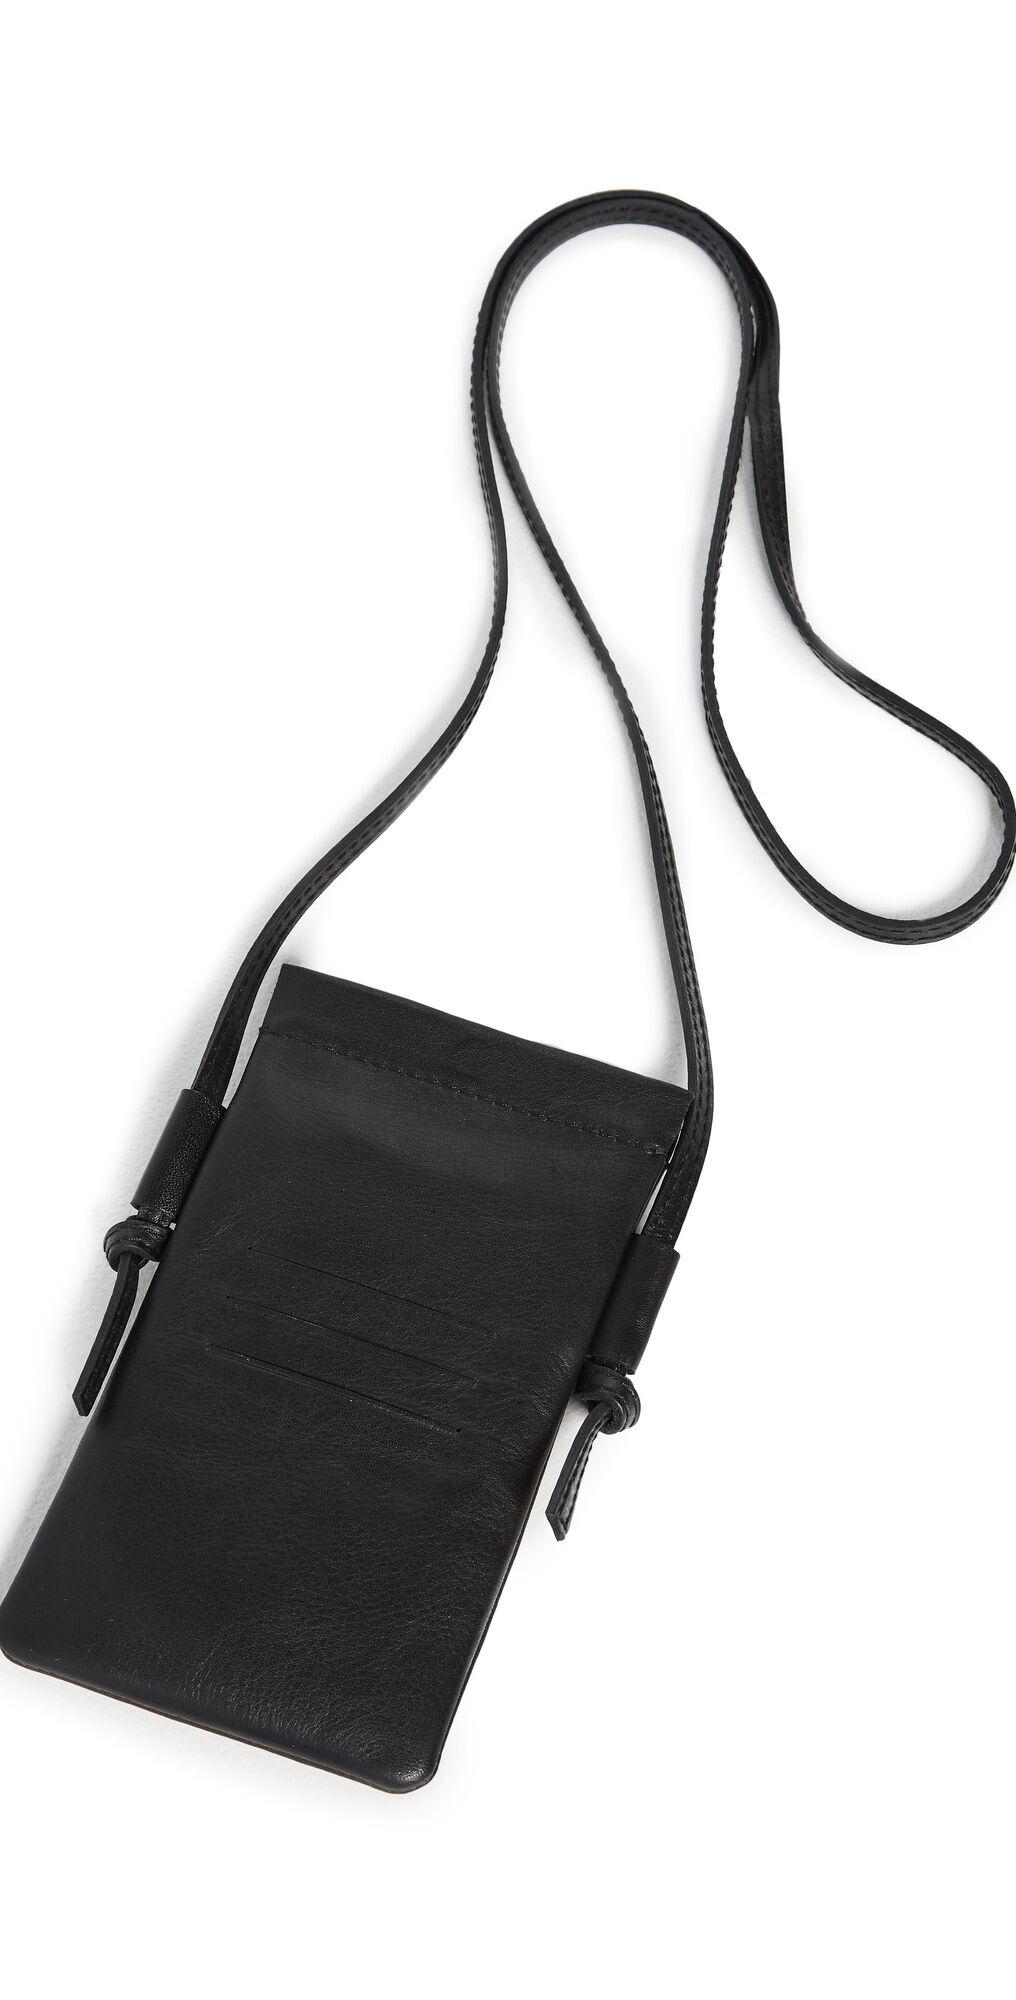 Madewell iPhone Crossbody Bag  - True Black - Size: One Size